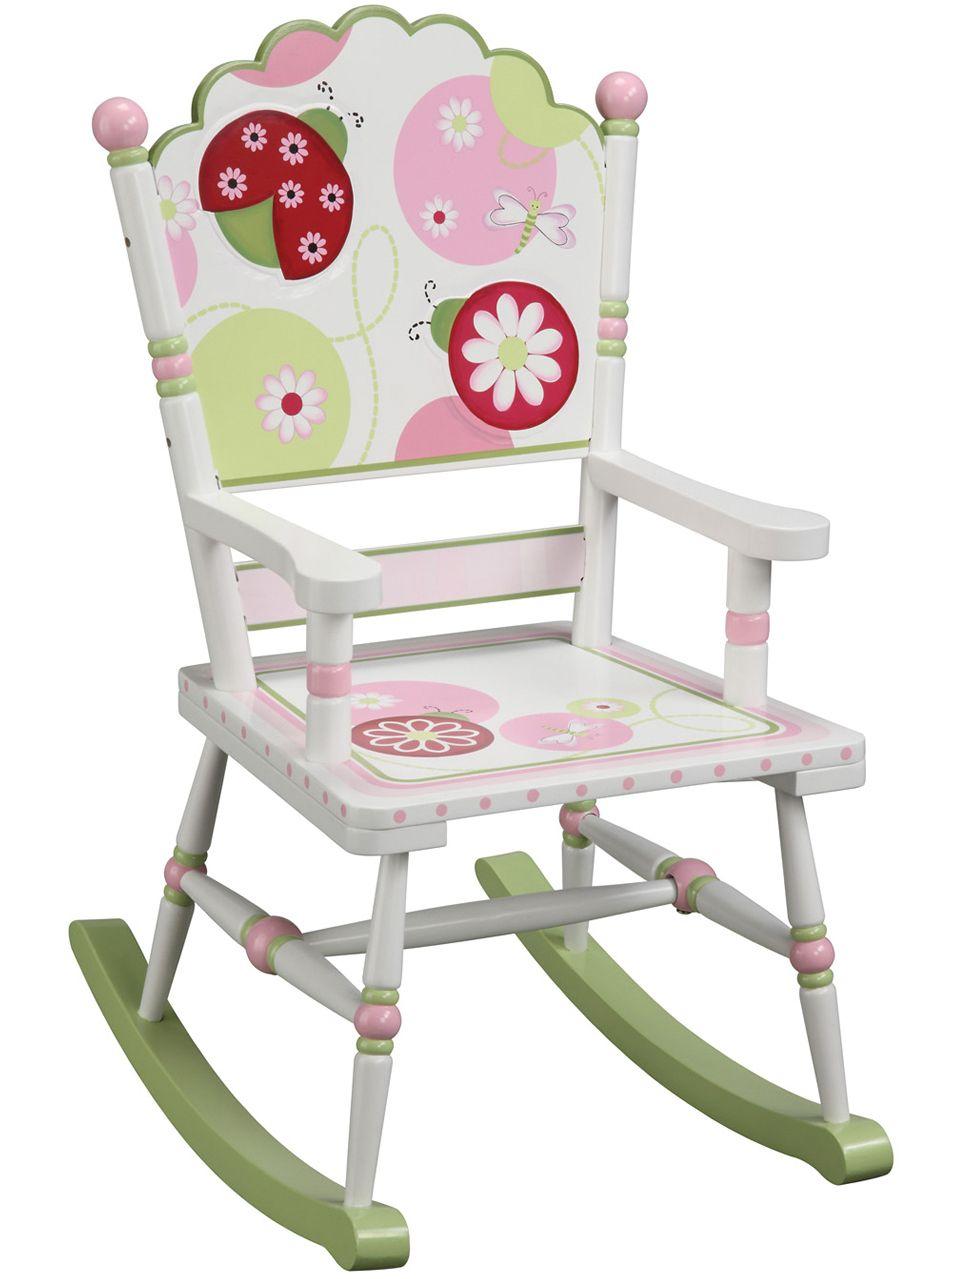 Girly Rocking Chair 163 76 99 Http Www Kidsfurnitureworld